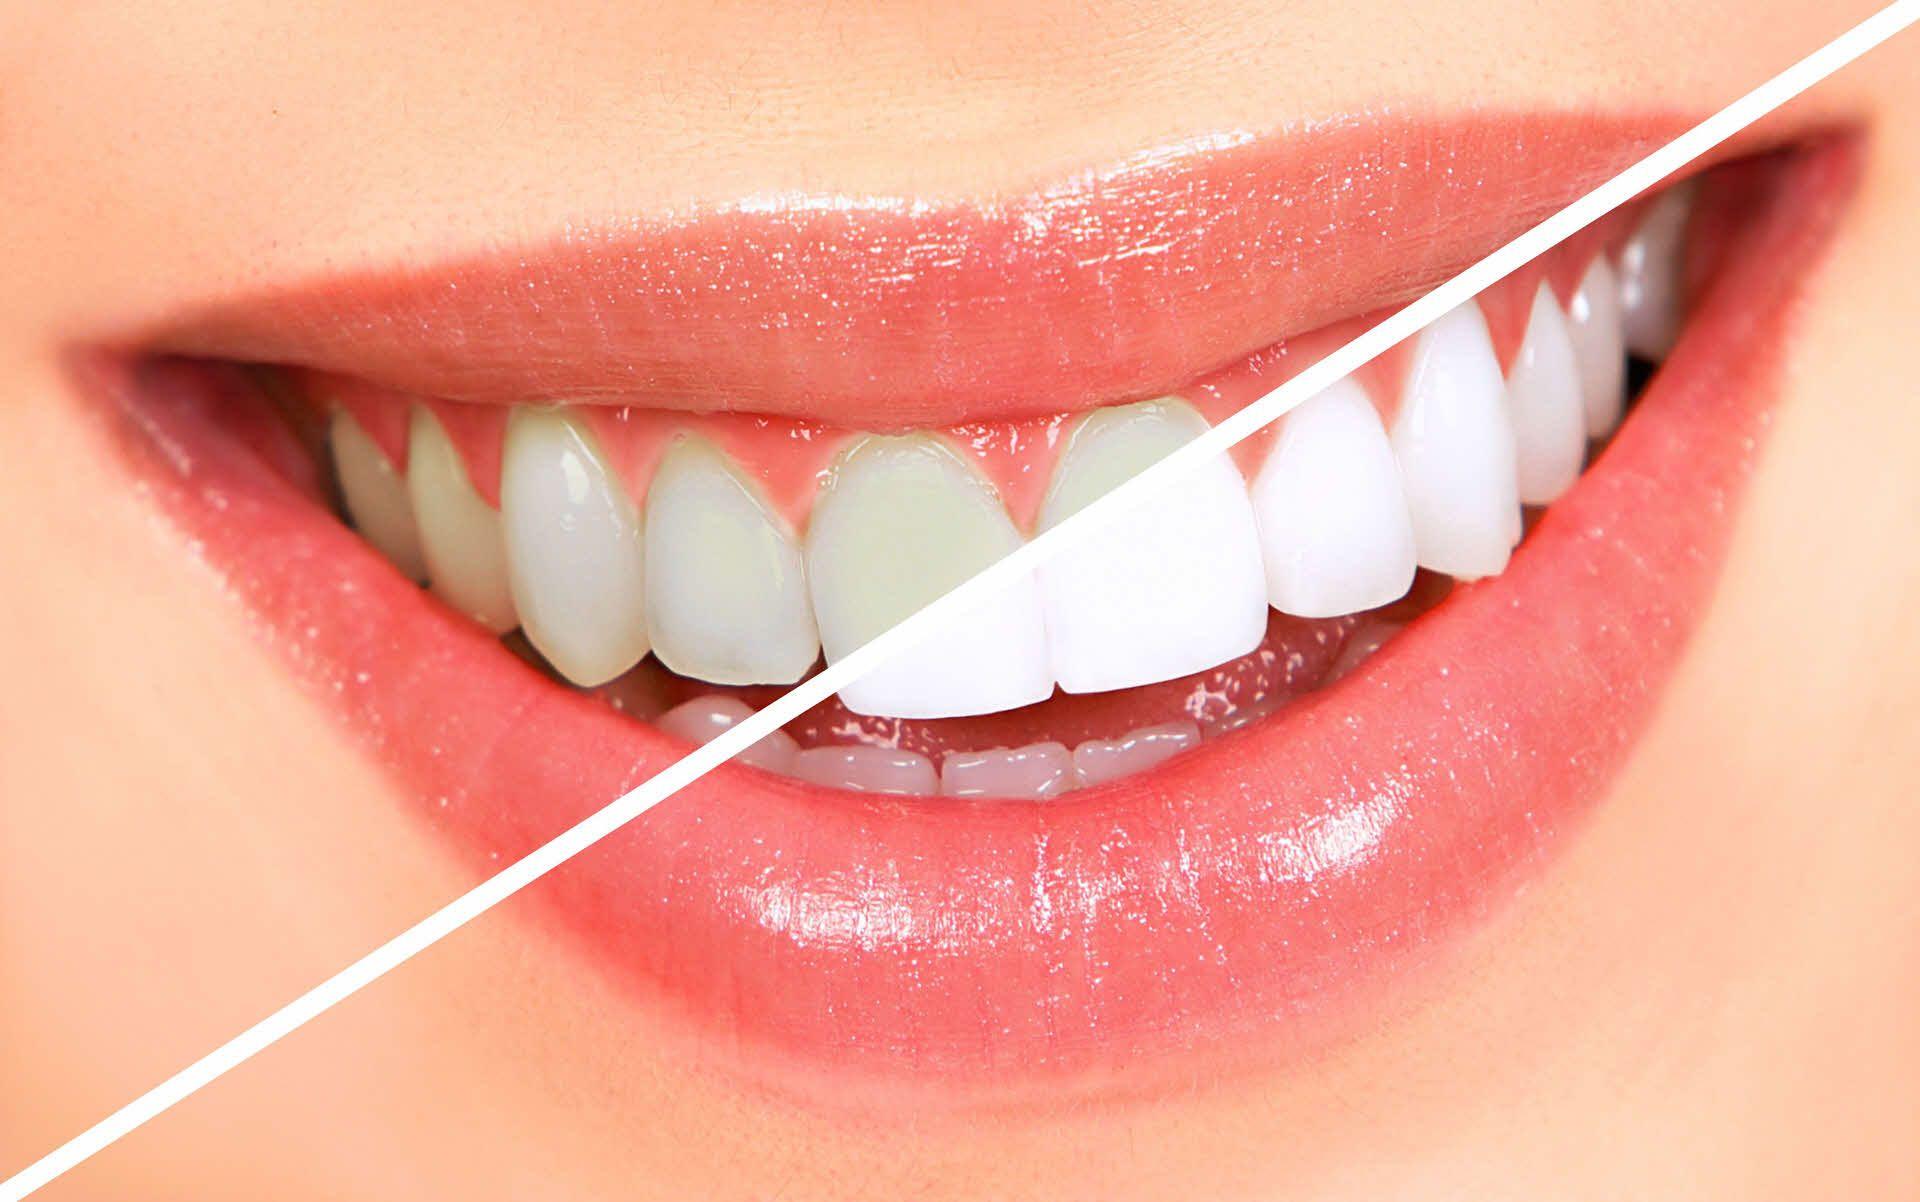 Clareamento Dental - Sorriso bonito e saudável